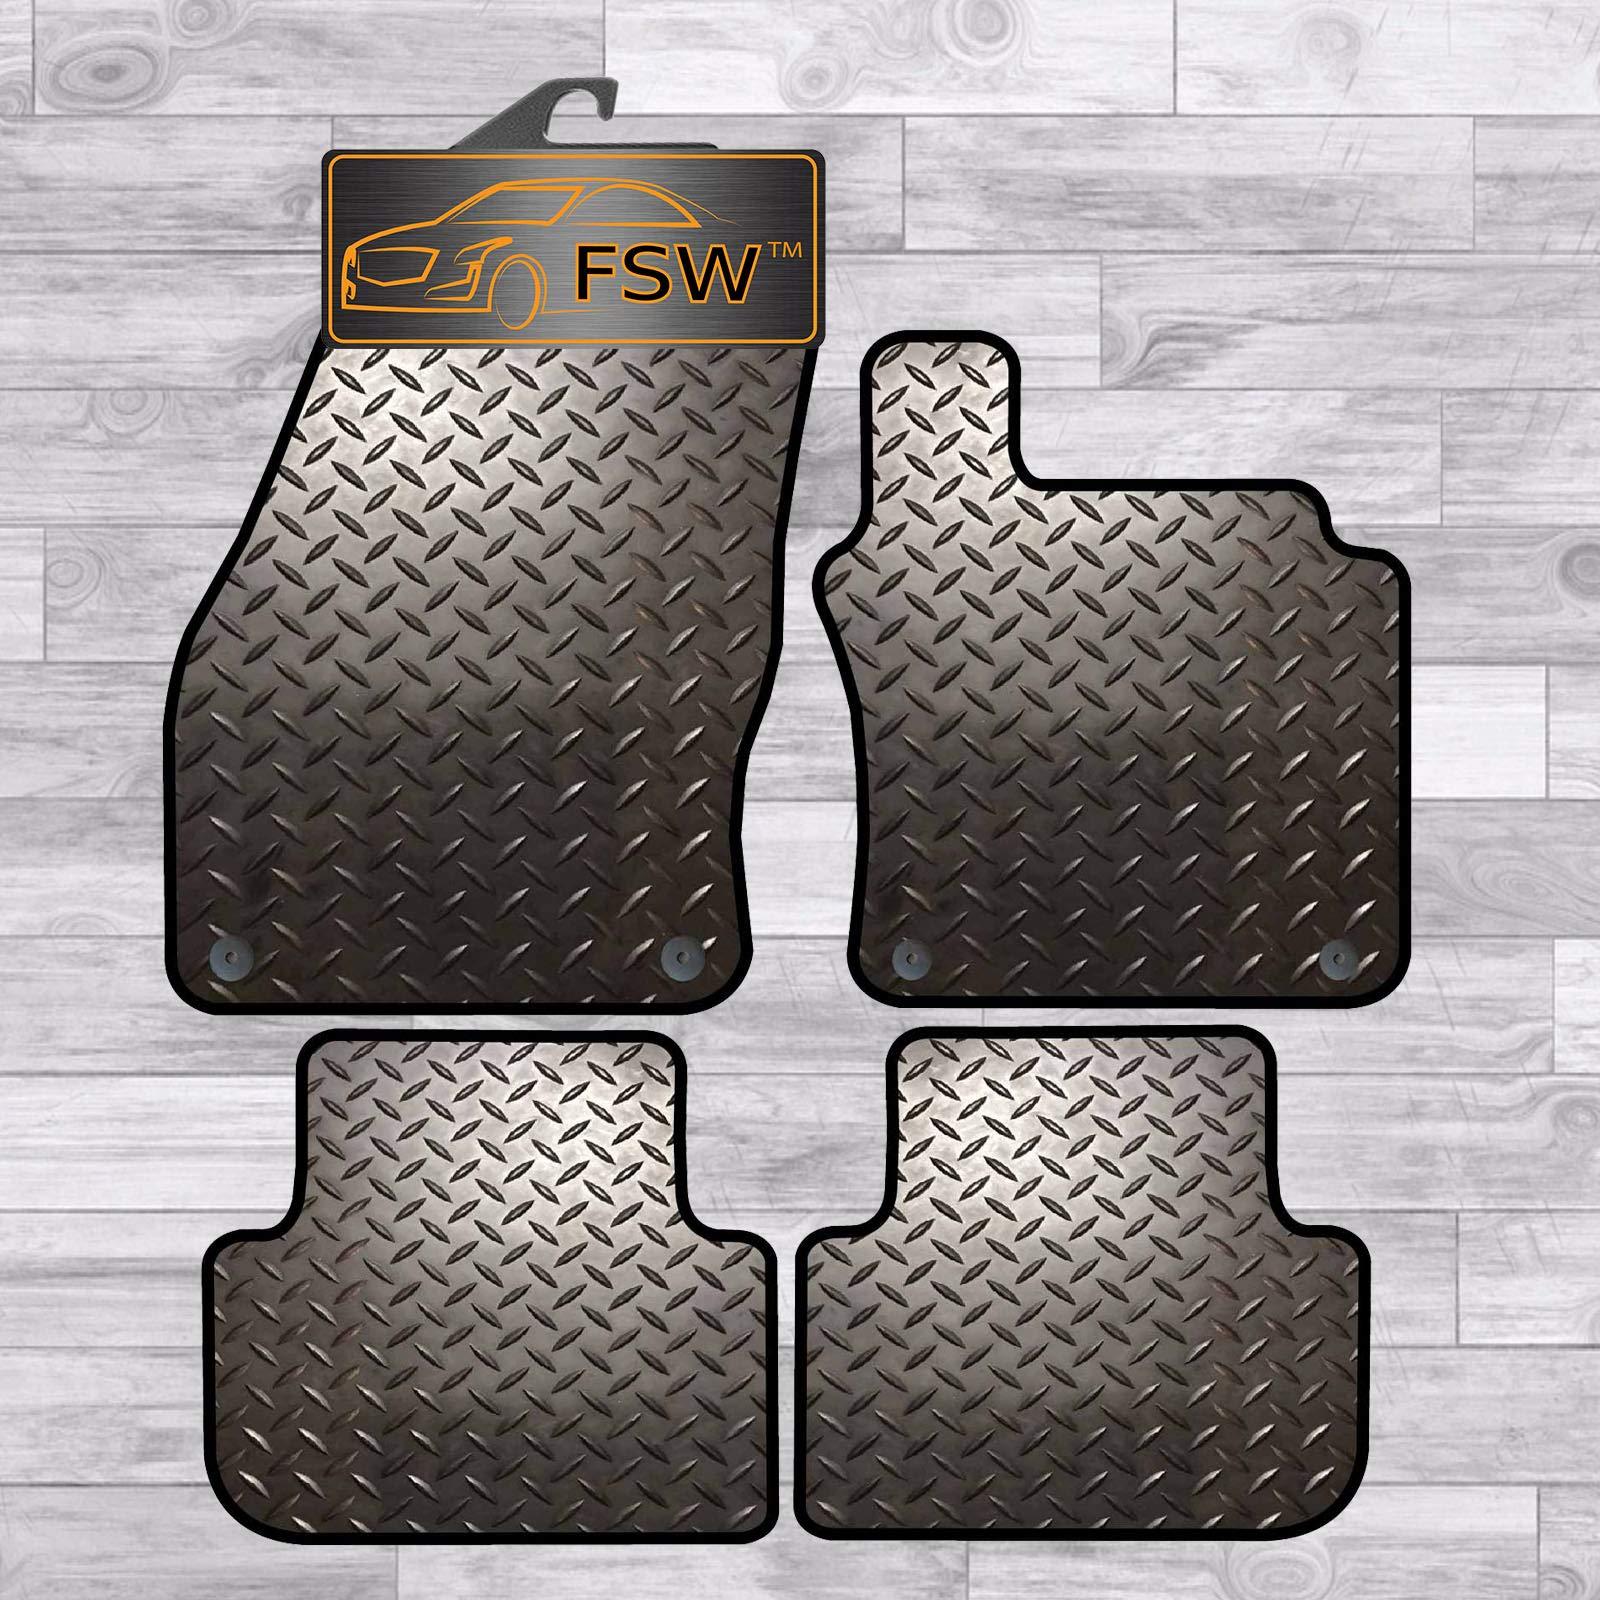 FSW Corsa D 2007-2014 Fully Tailored 3MM Rubber Heavy Duty Car Floor Mats